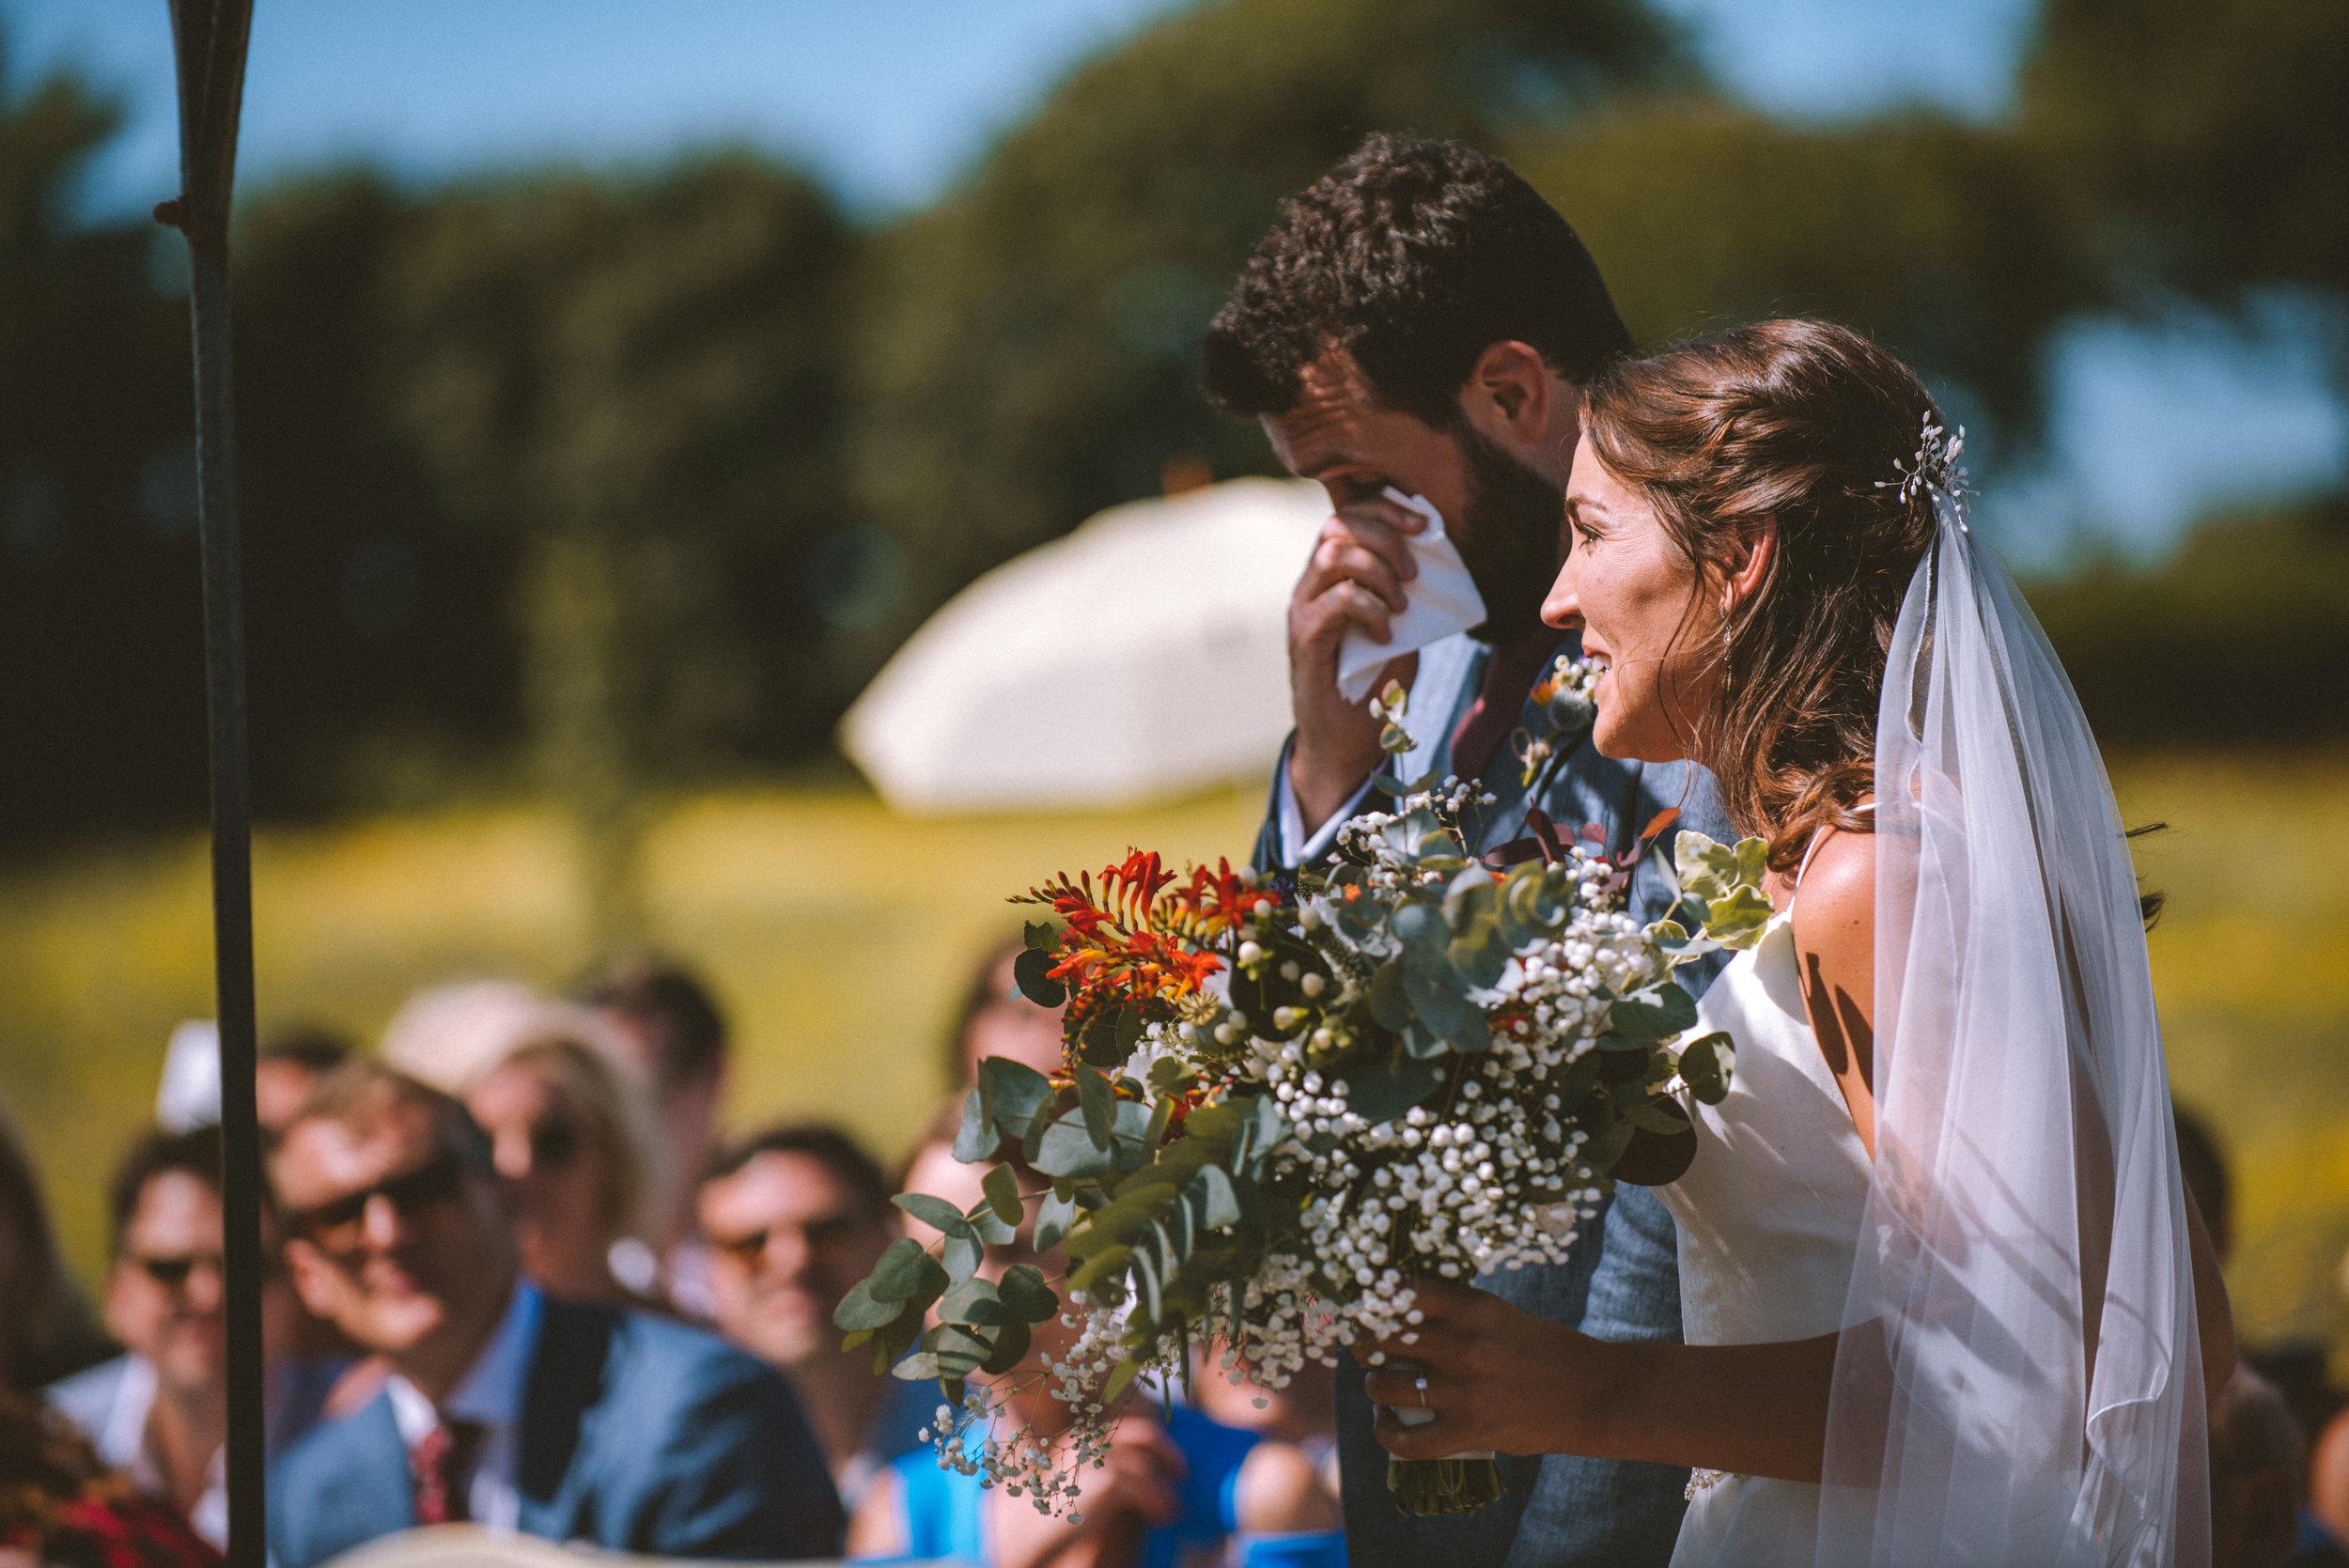 ash-barton-estate-wedding-photographer-mark-shaw-24.jpg